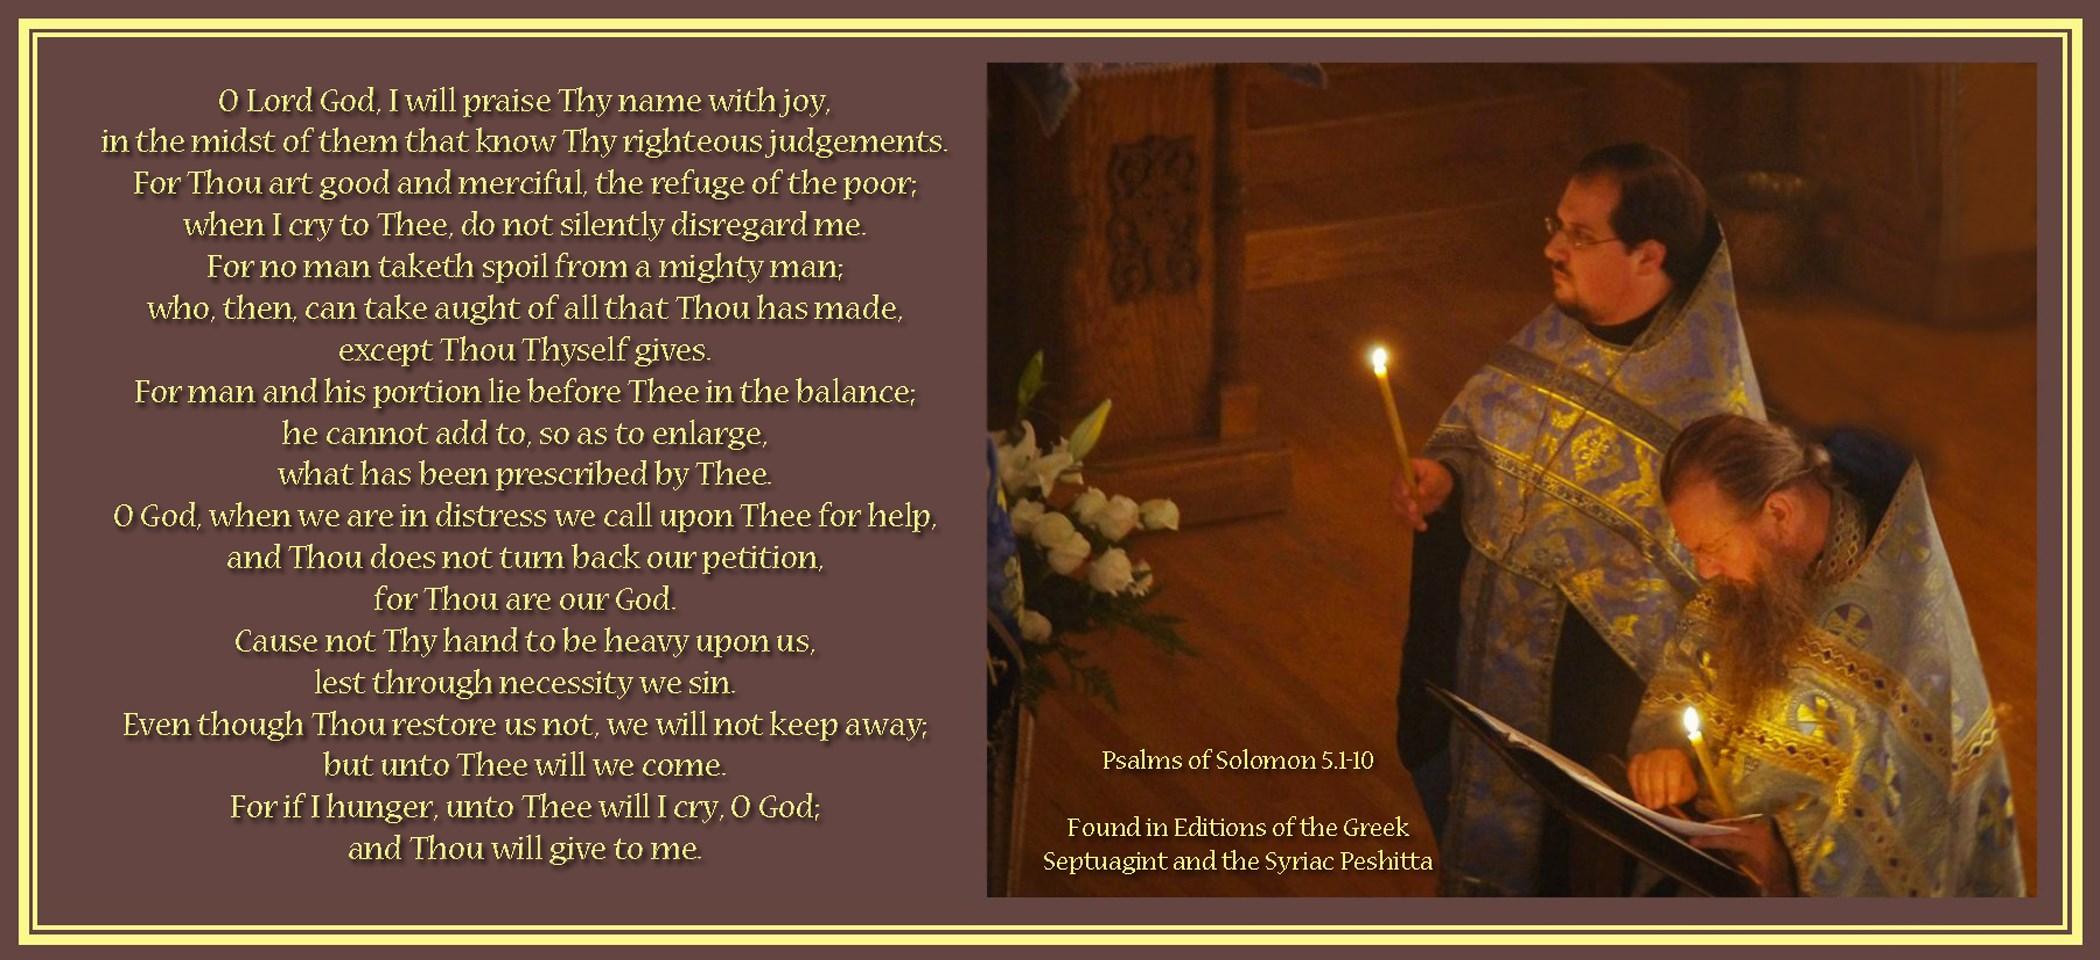 00 psalm of solomon priests 290815